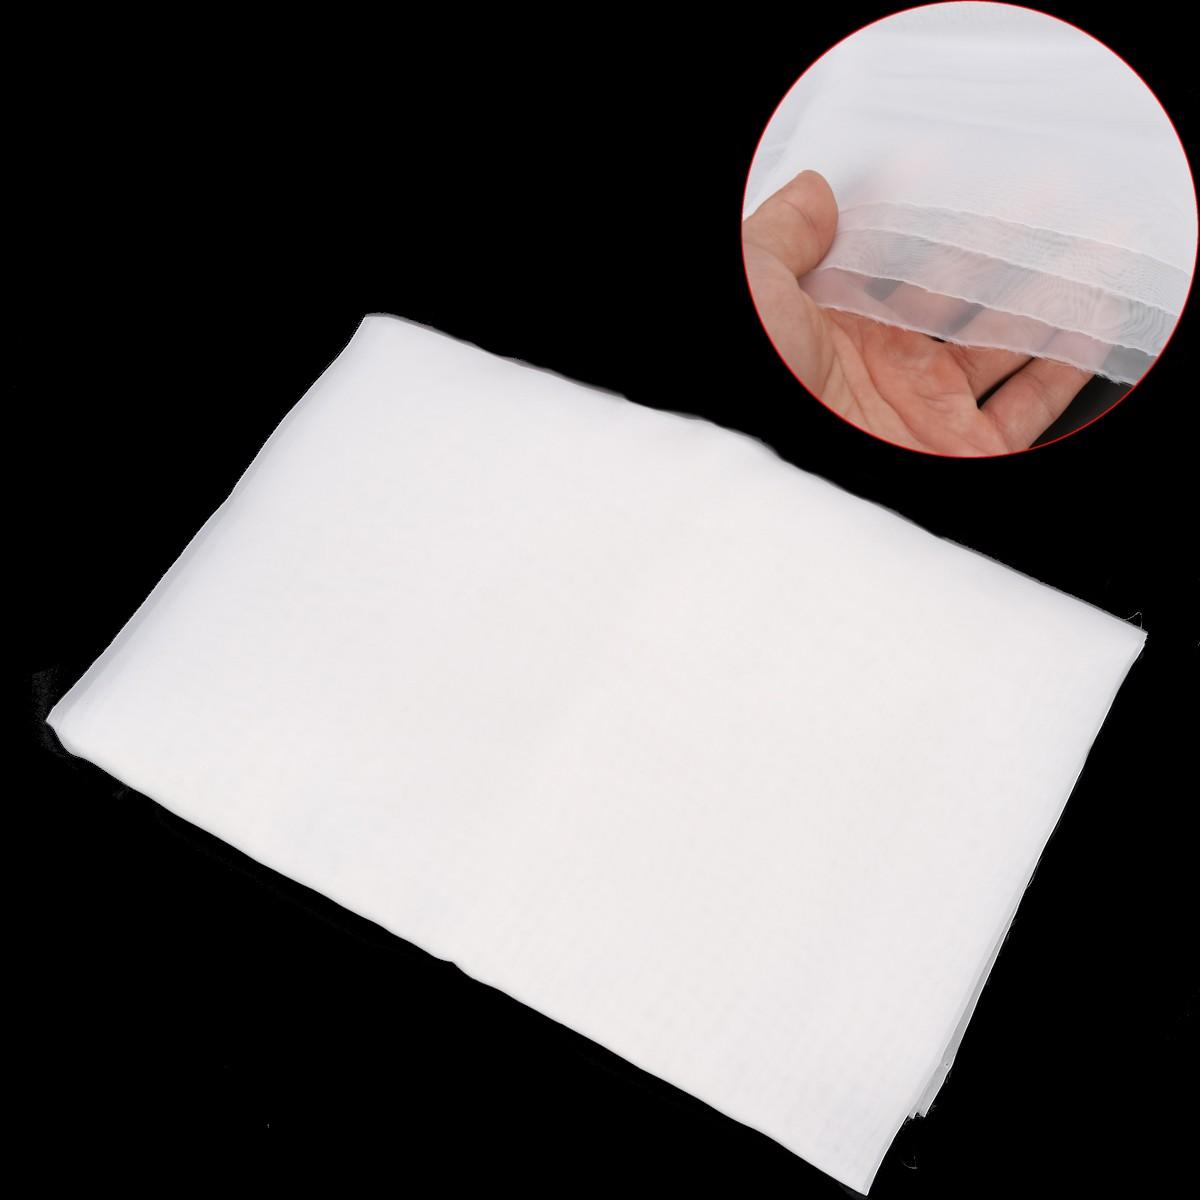 90x127cm Silk Screen Printing Mesh Fabric White 60Mesh 24T 1 Yard